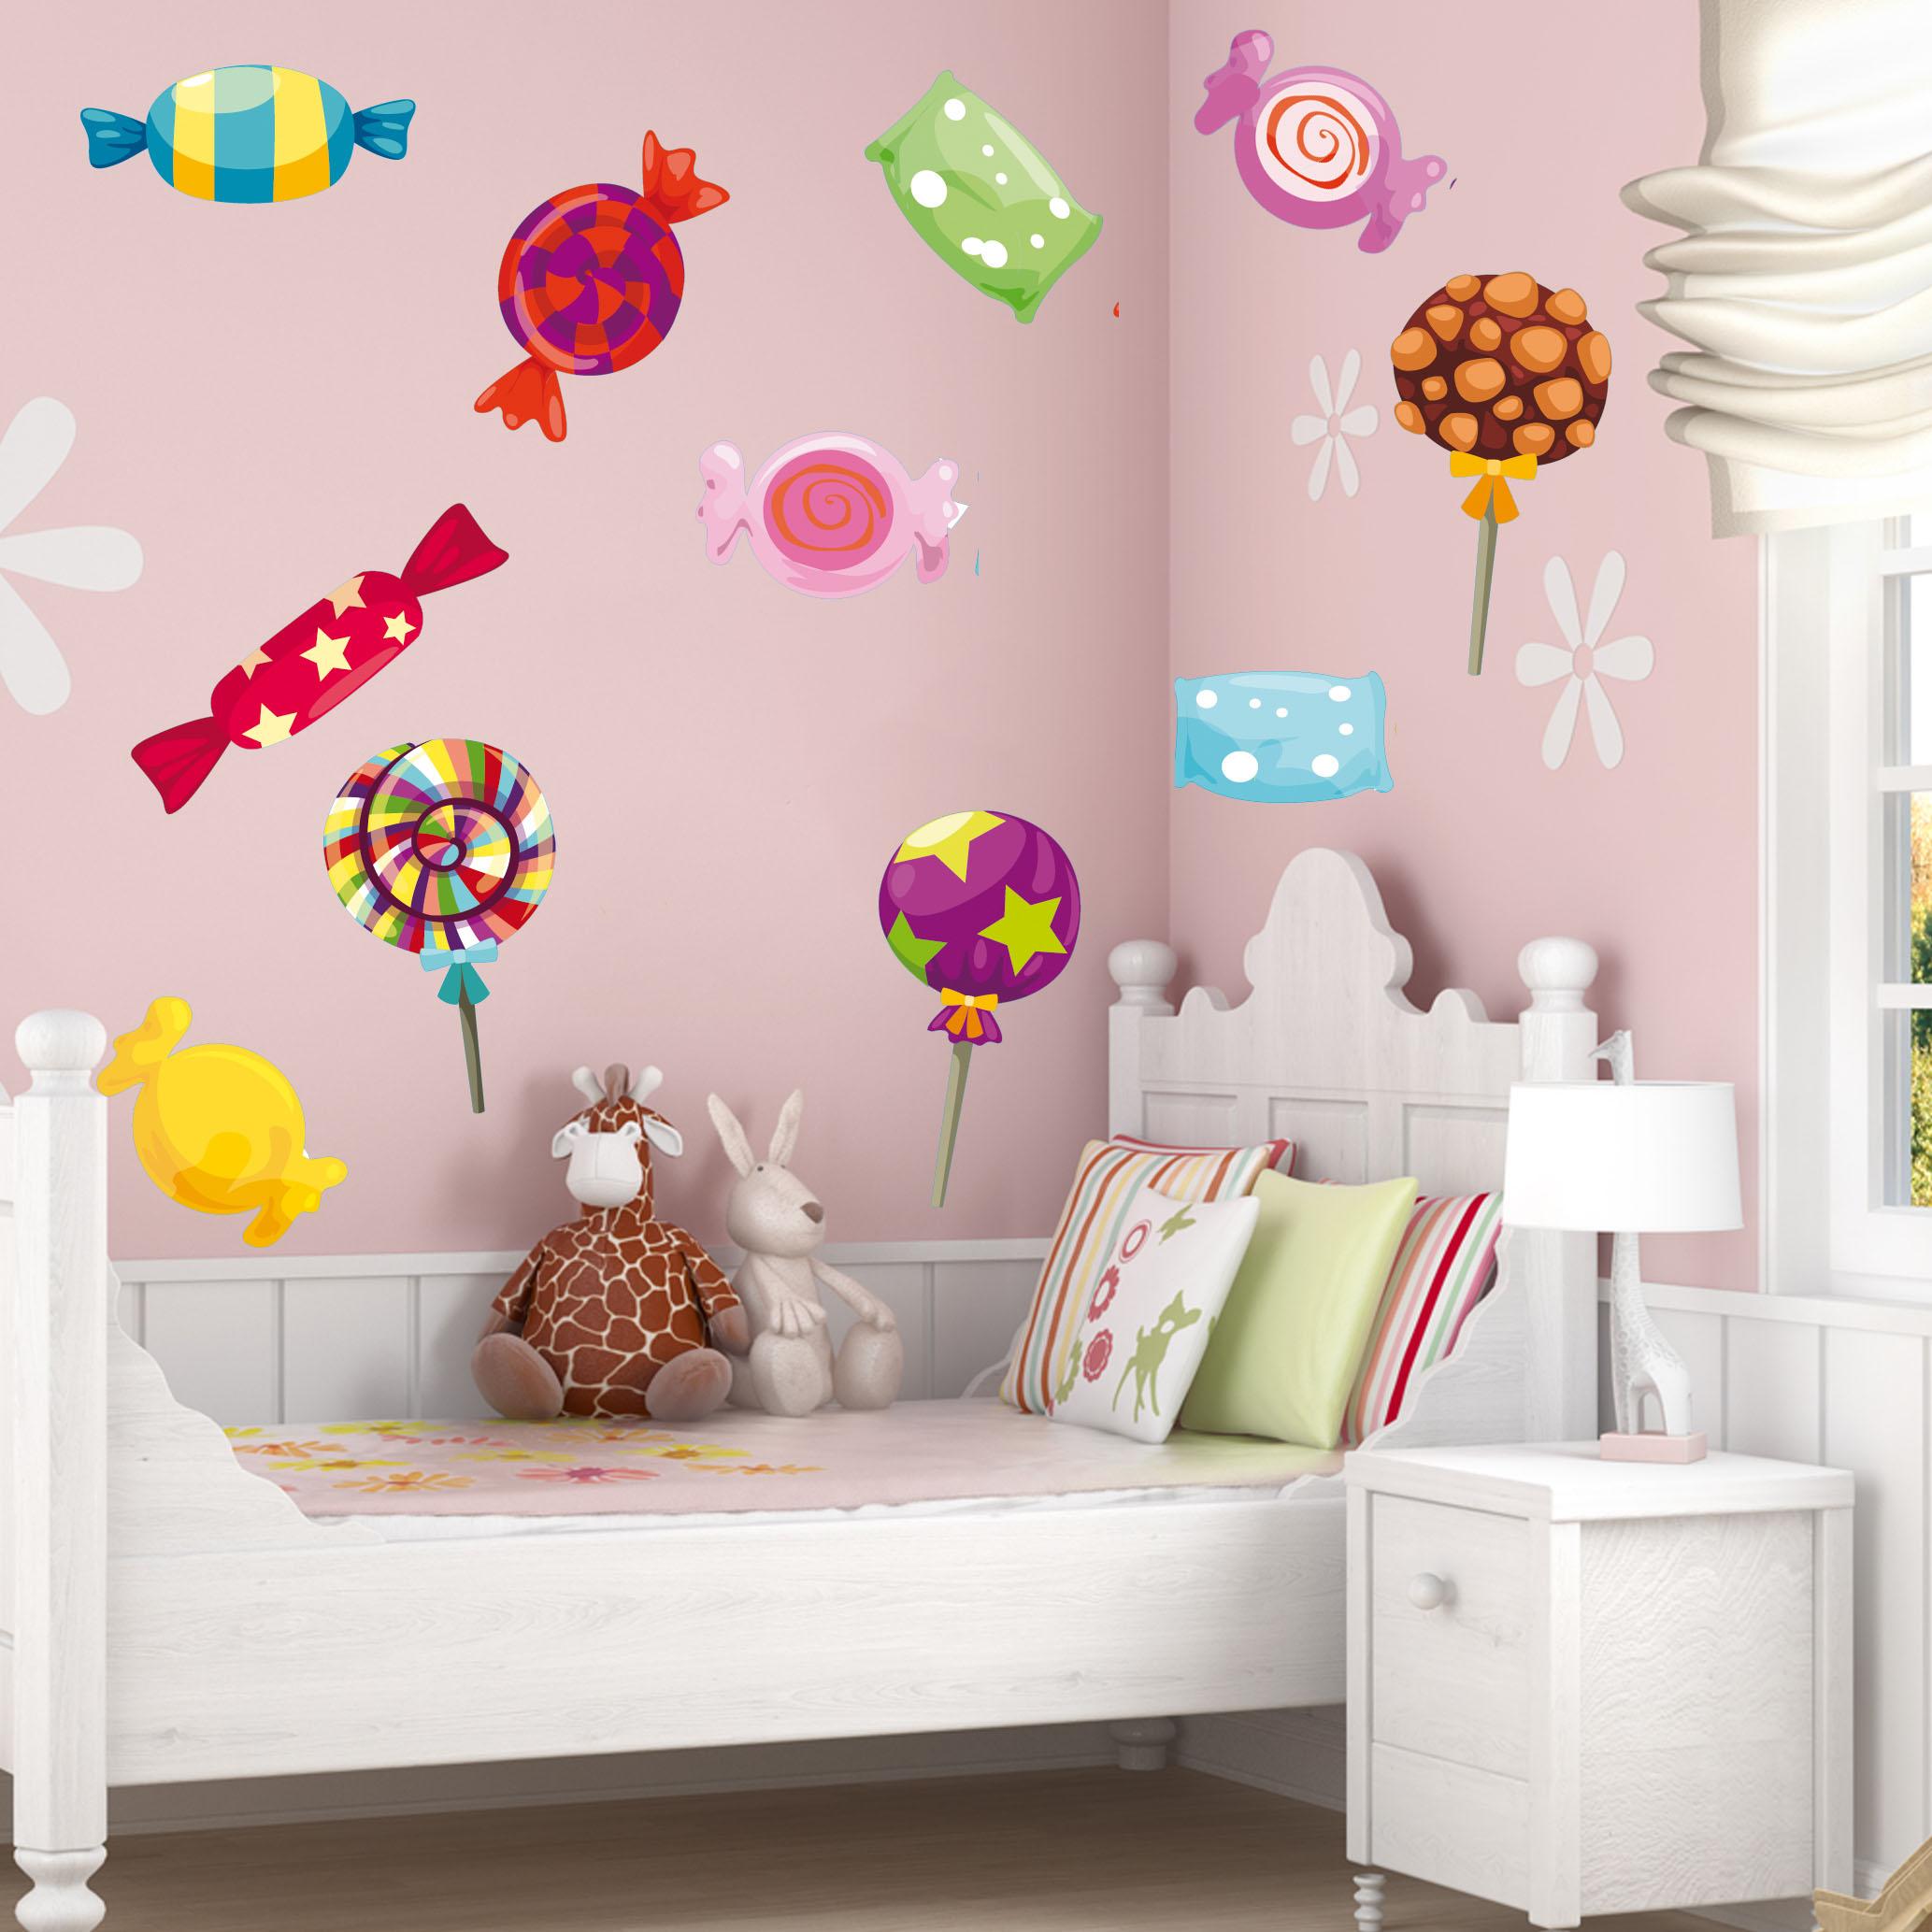 Wandtattoos folies : Wandtattoo Süßigkeiten Set